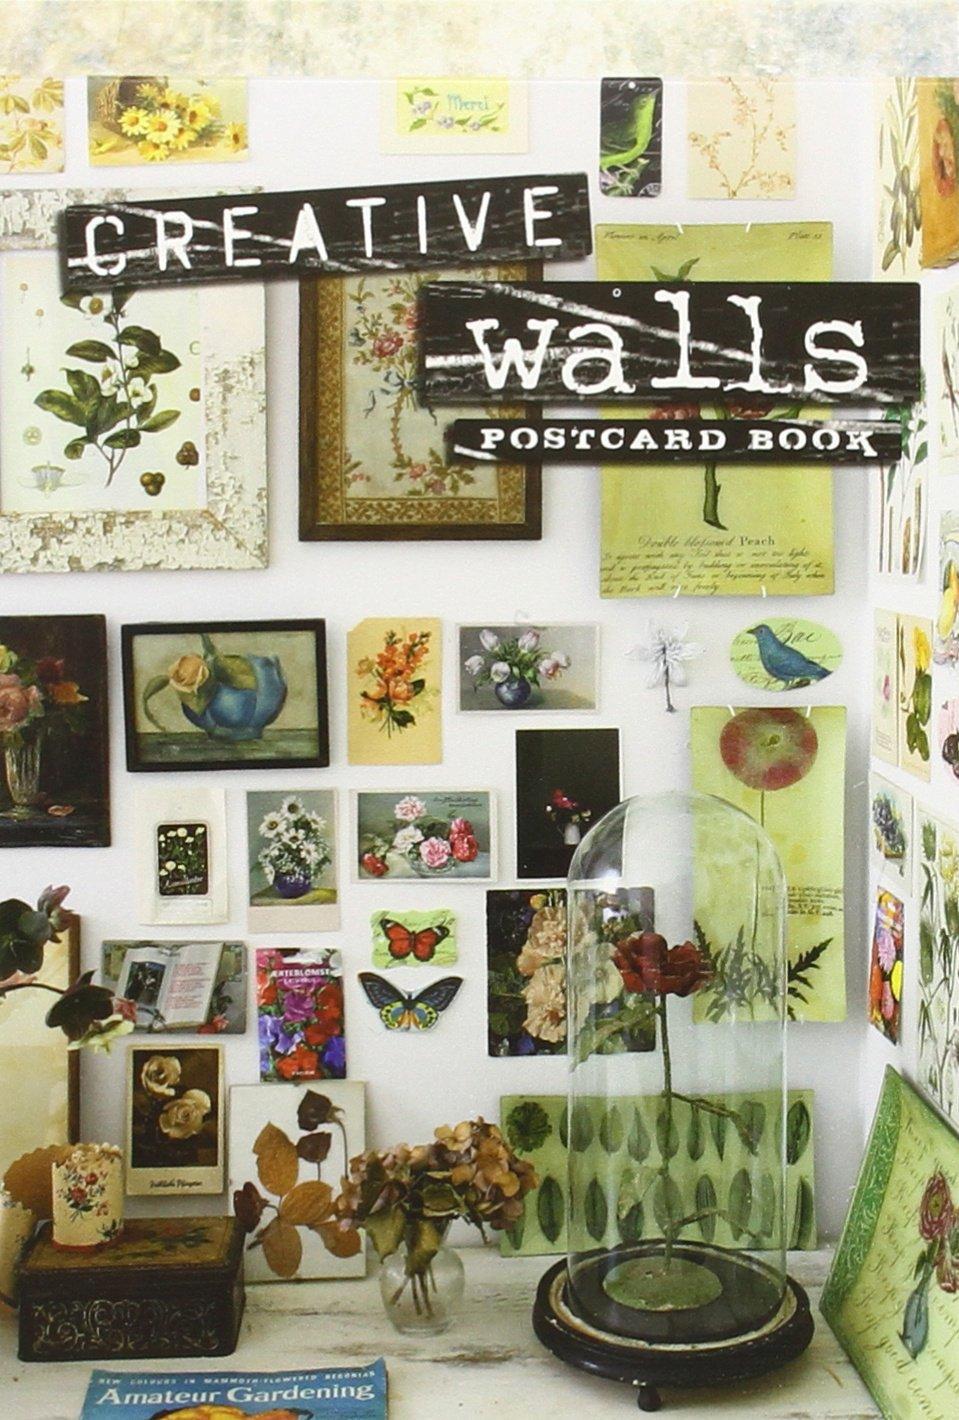 Creative Walls Postcard Book 10 Pack PDF